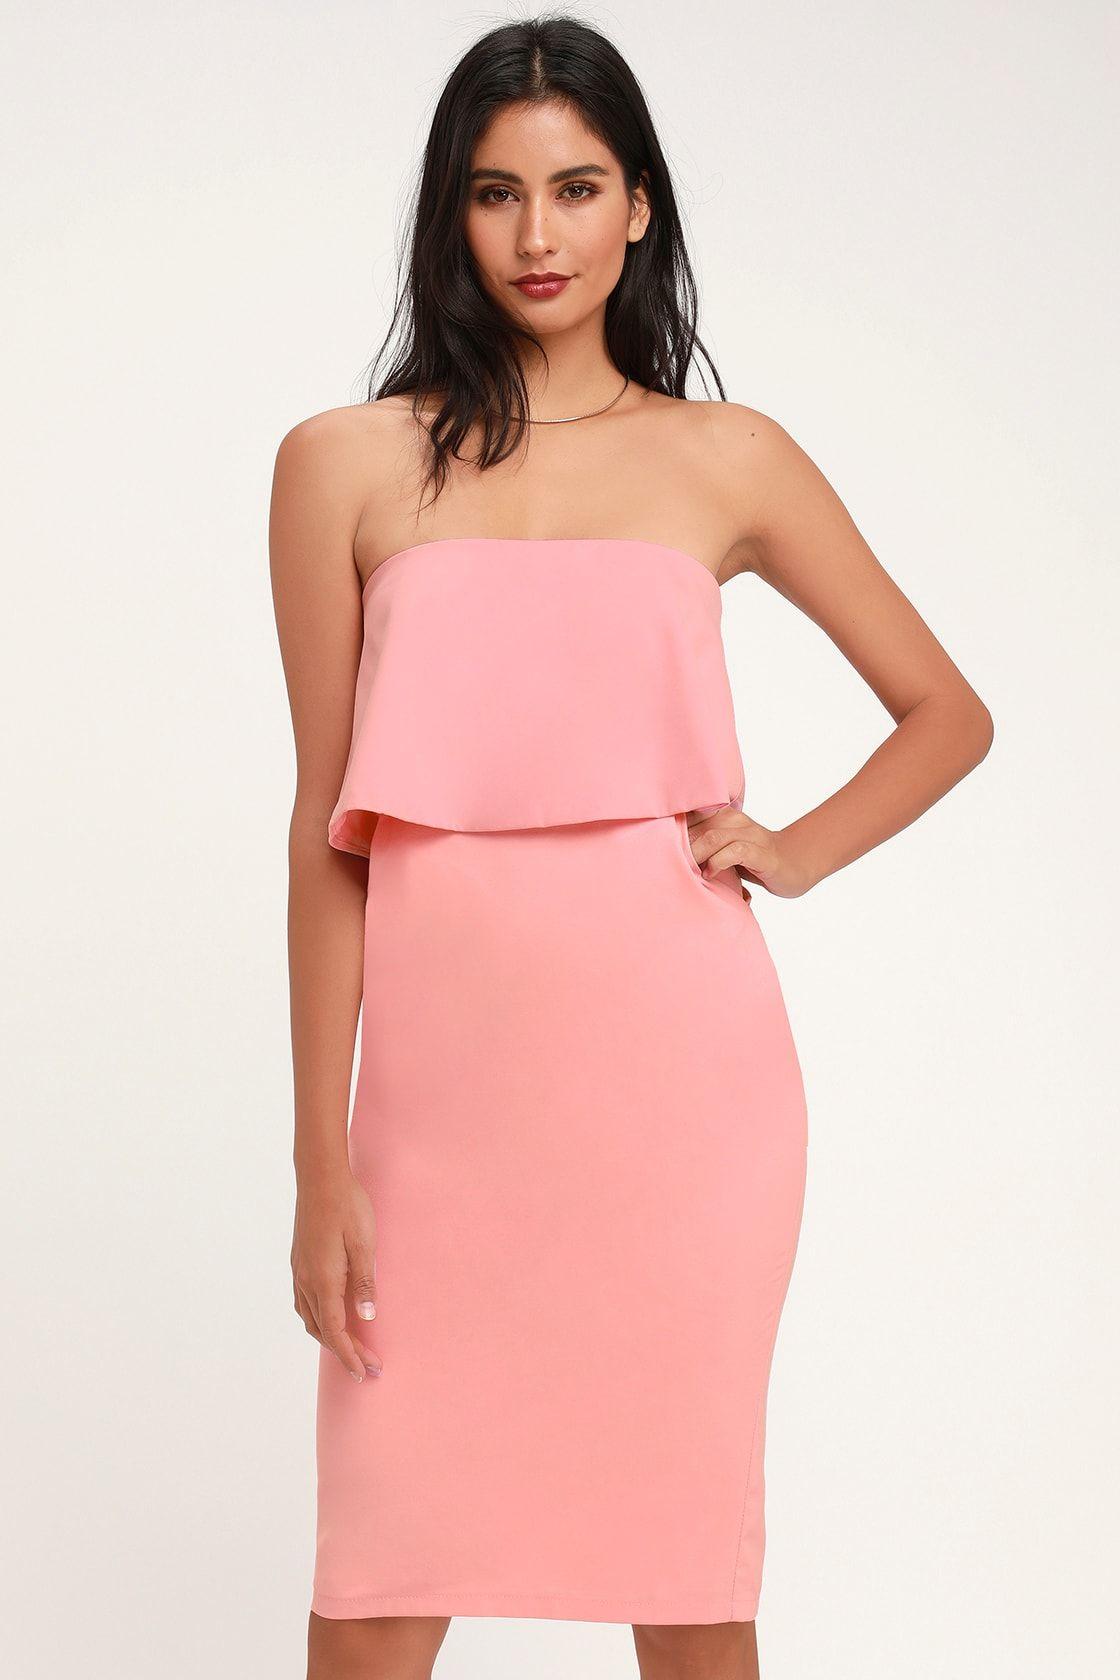 Lots Of Love Light Pink Strapless Midi Dress Strapless Midi Dress Dresses Midi Dress Bodycon [ 1680 x 1120 Pixel ]